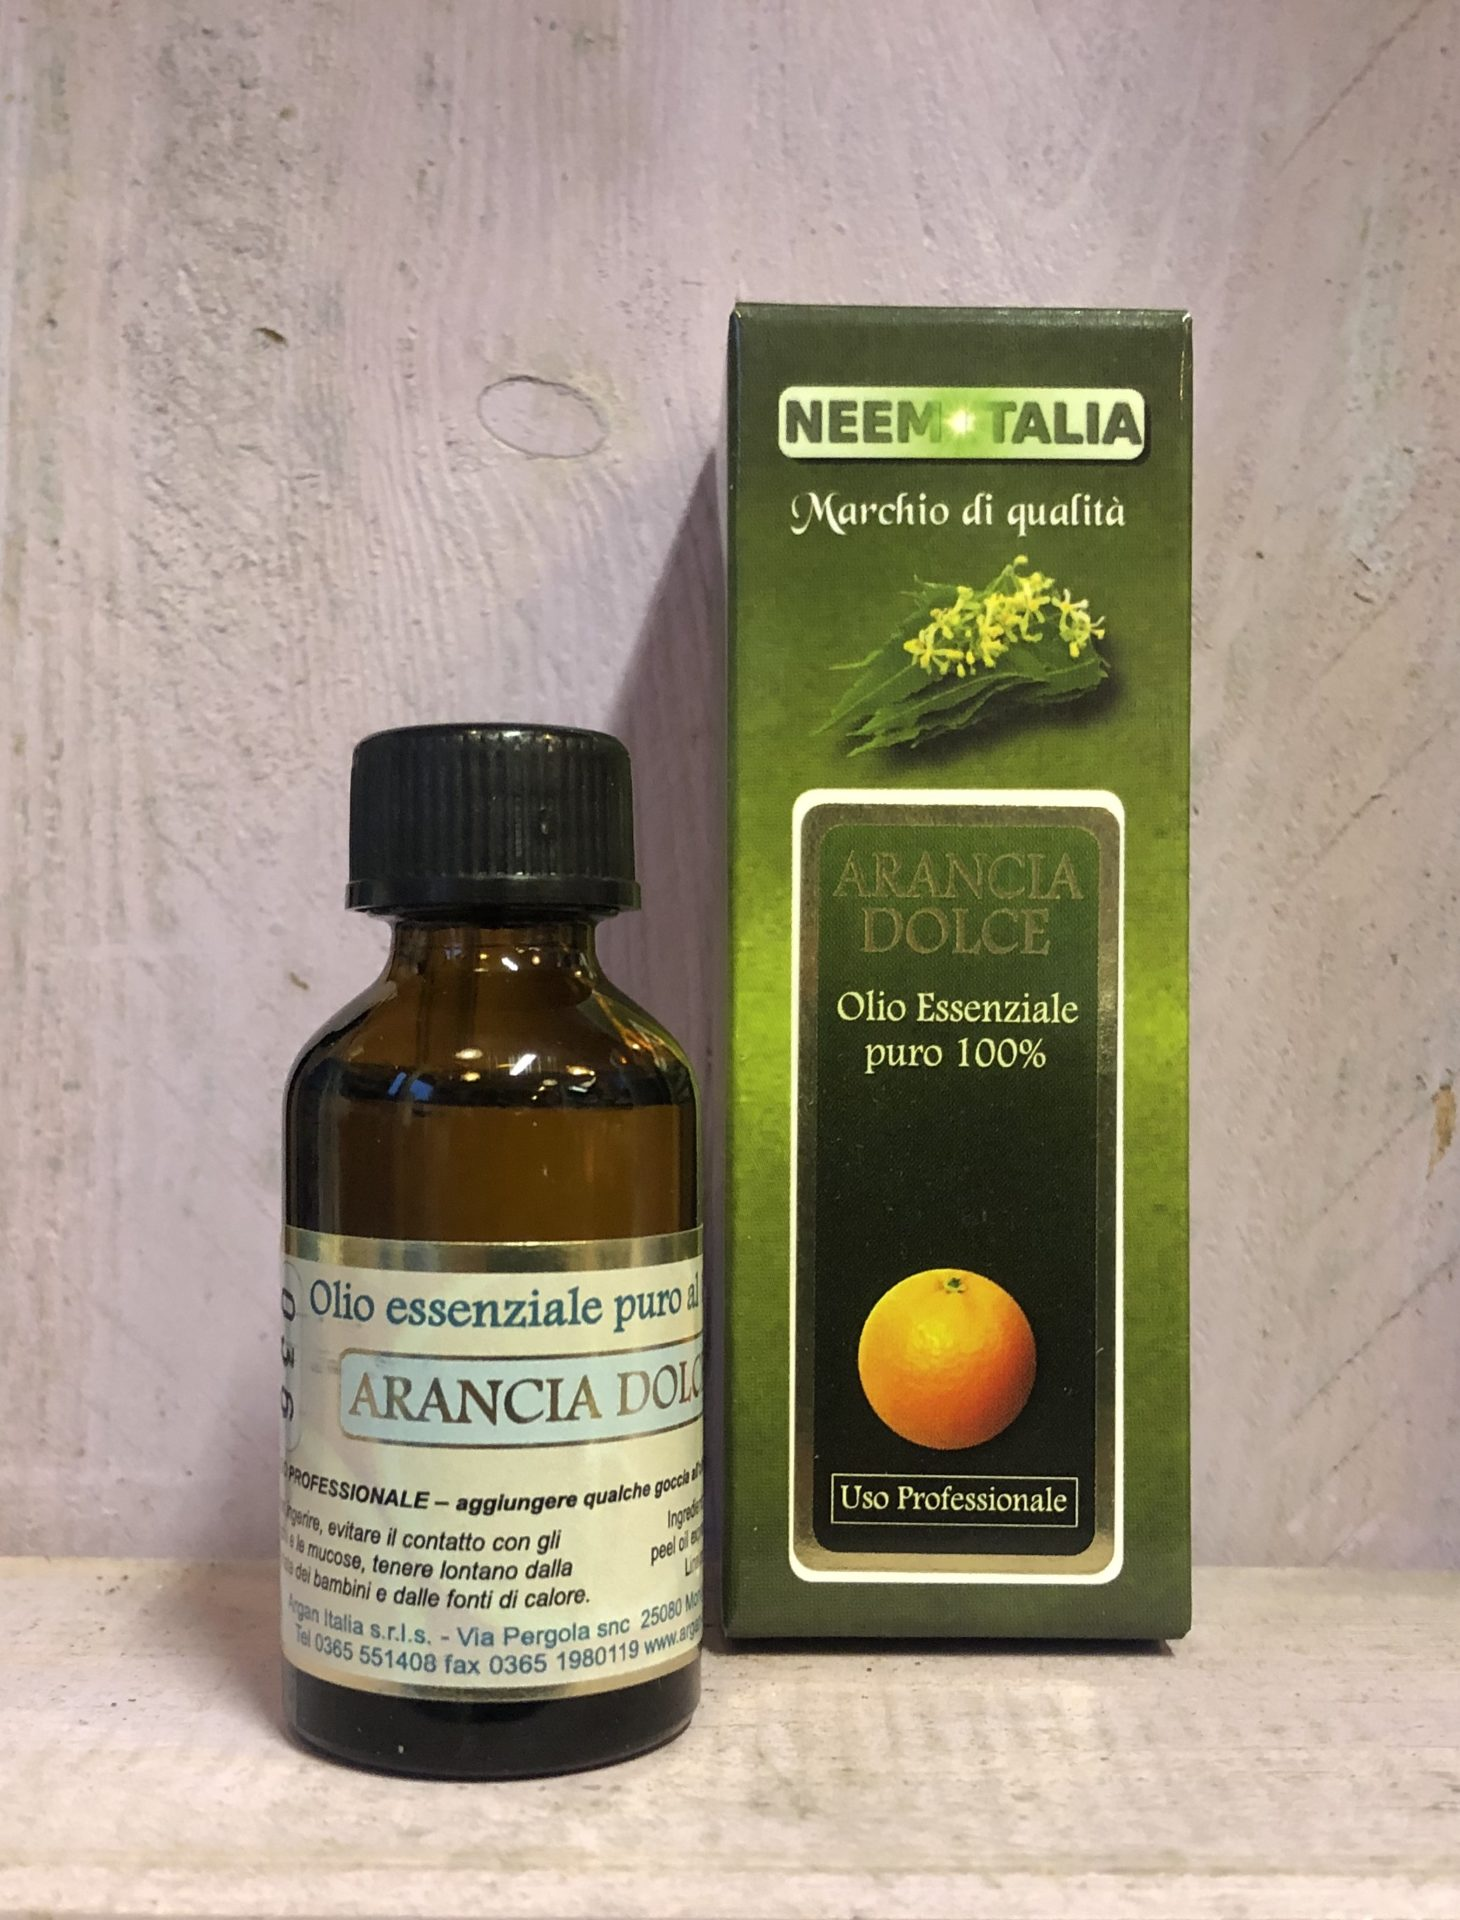 olio essenziale arancia dolce